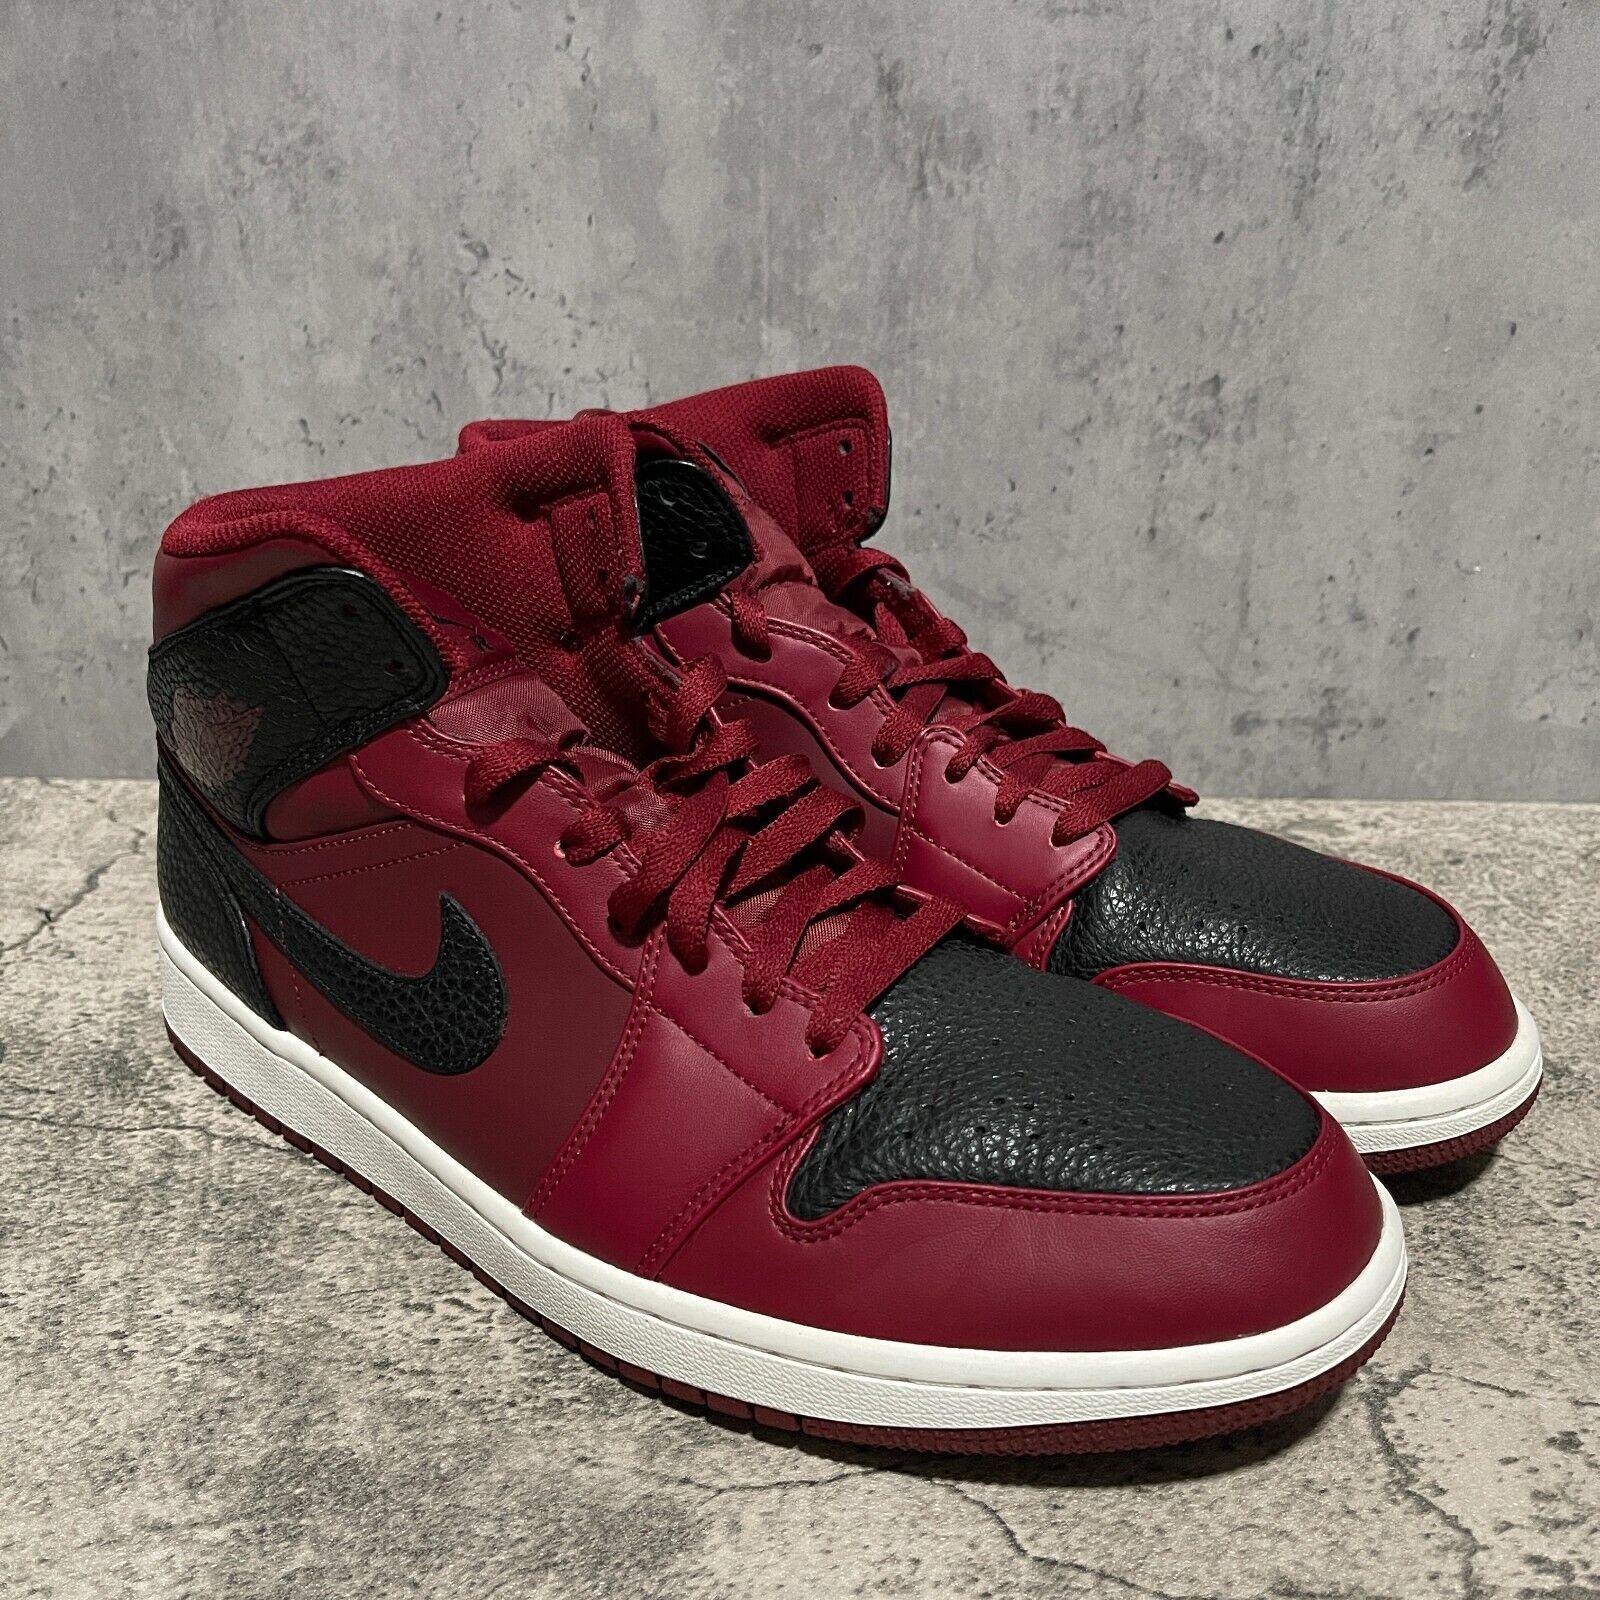 Nike Air Jordan 1 Retro Mid Team Red Black Men's Size 12 [554724-601]